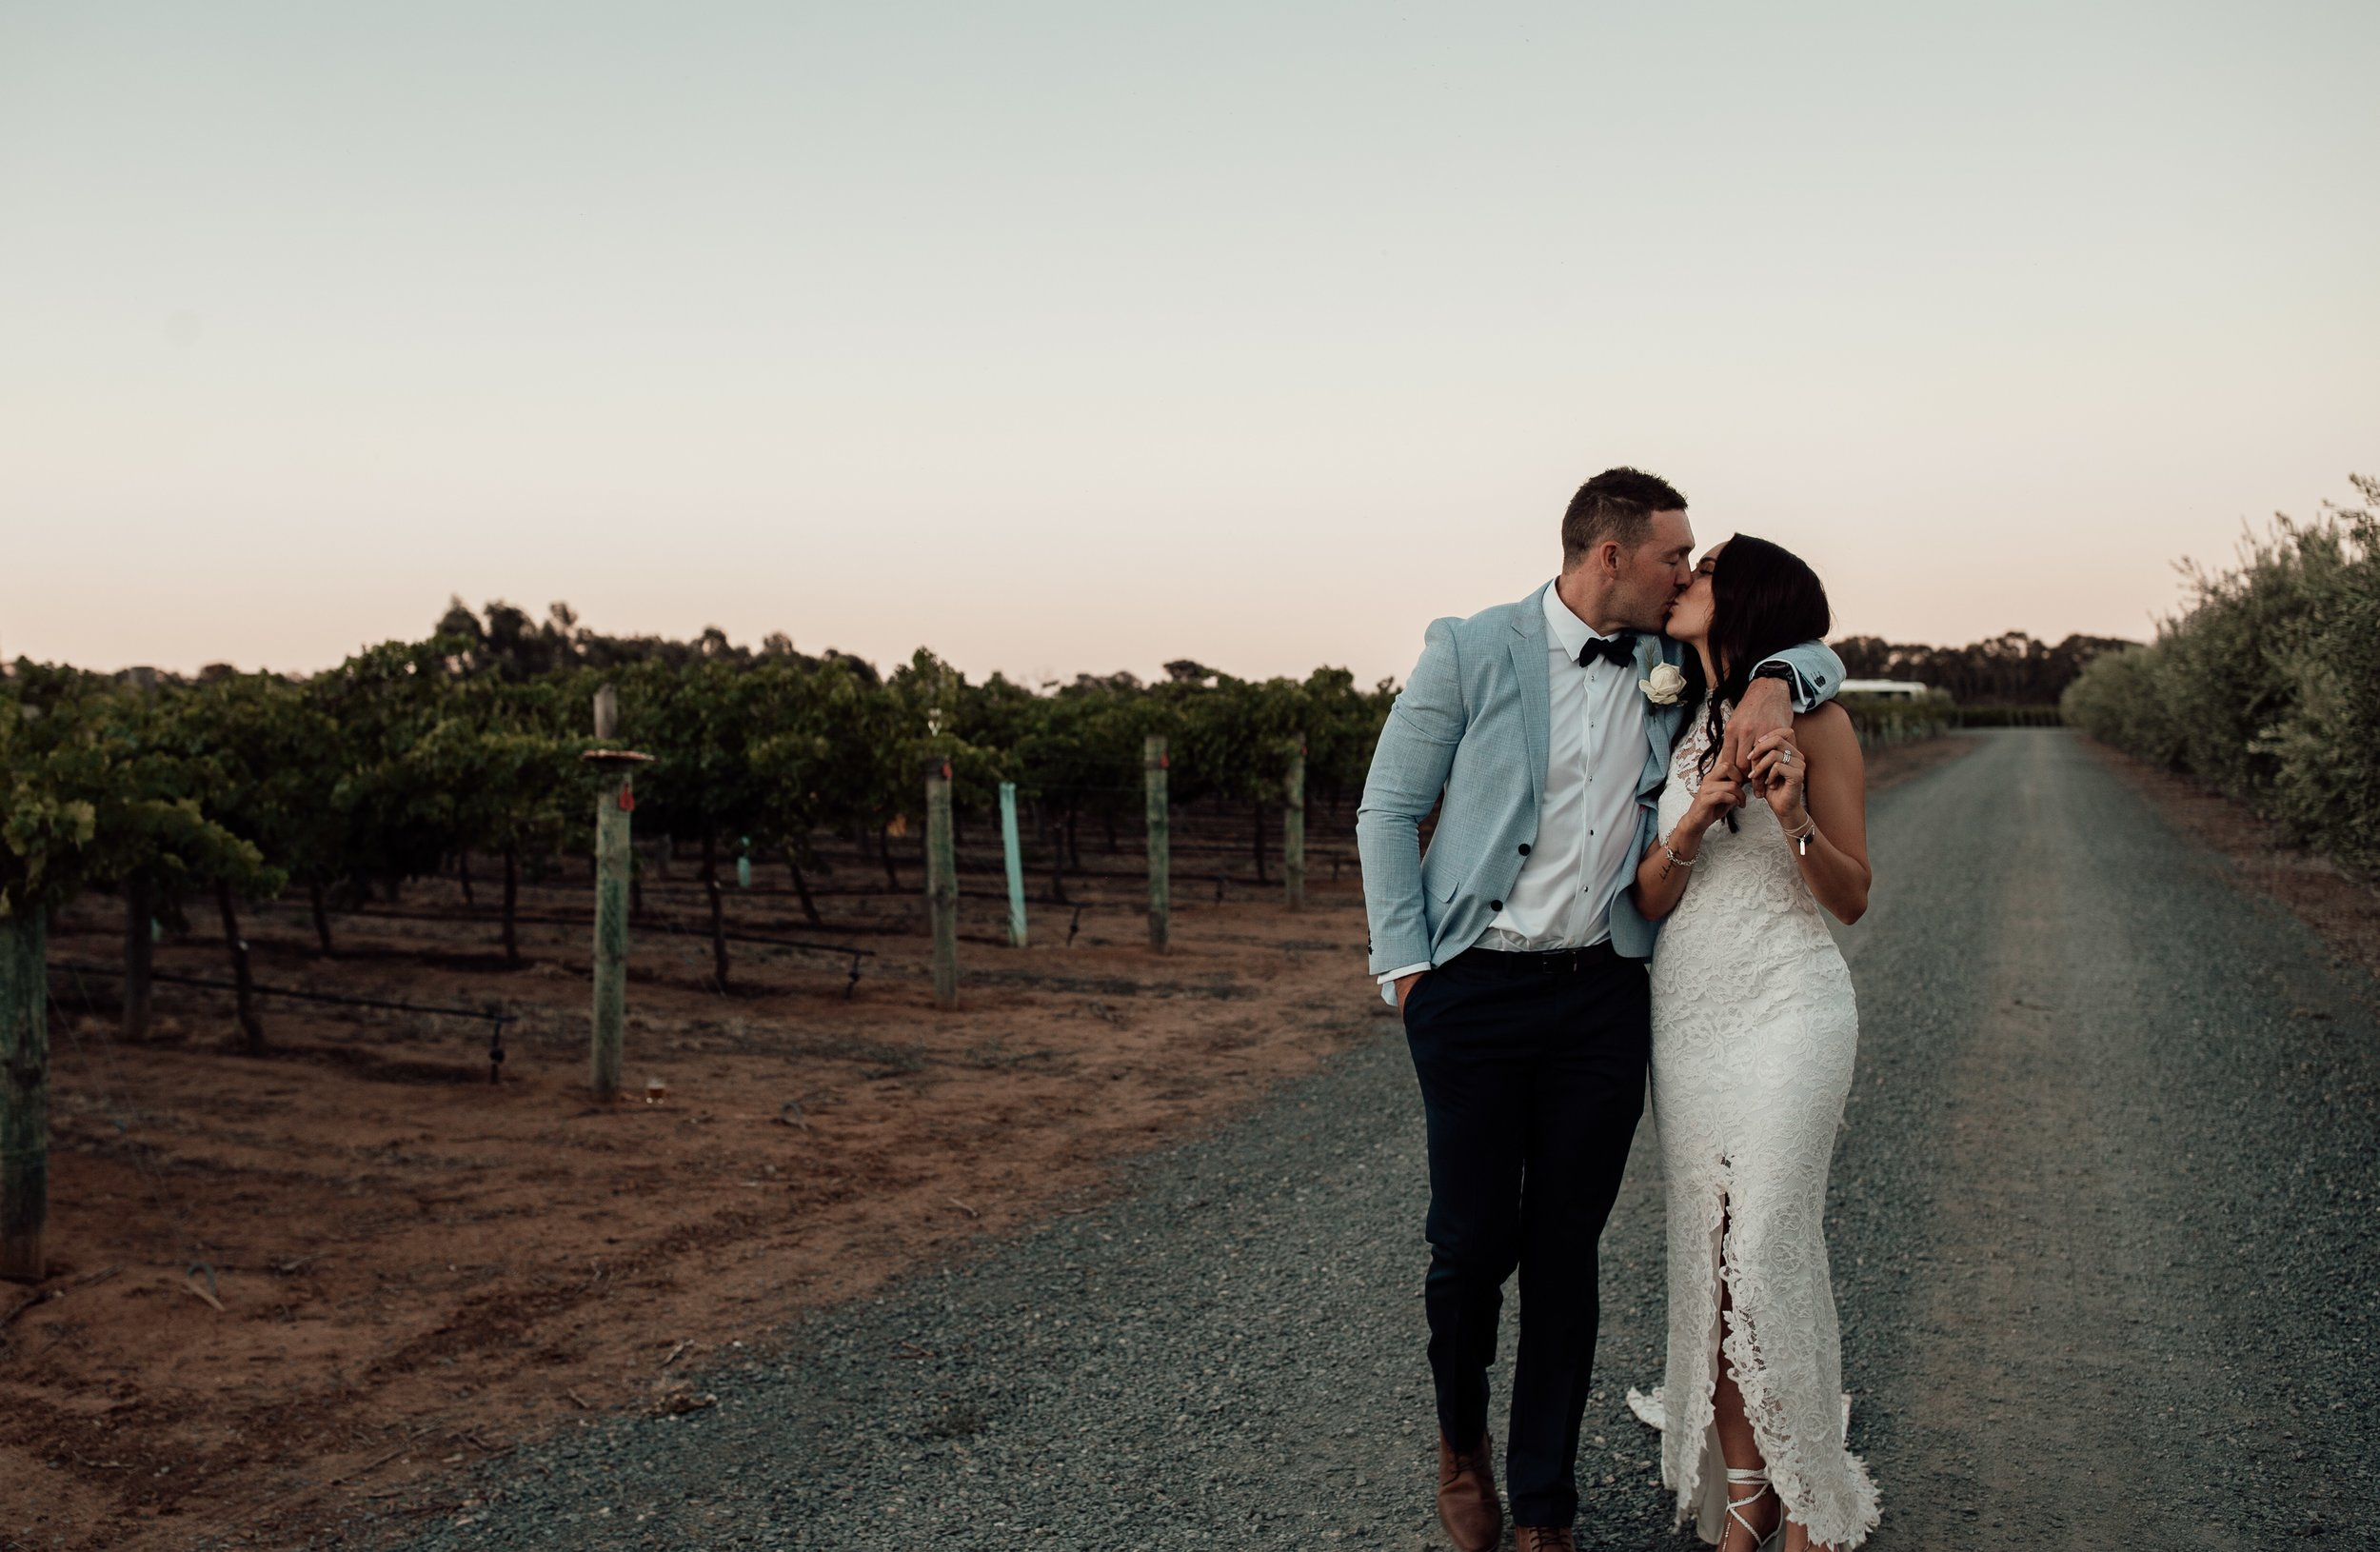 mickalathomas_puremacphotography_weddingphotographer_couplephotographer_Sheppartonphotographer_2930.jpg